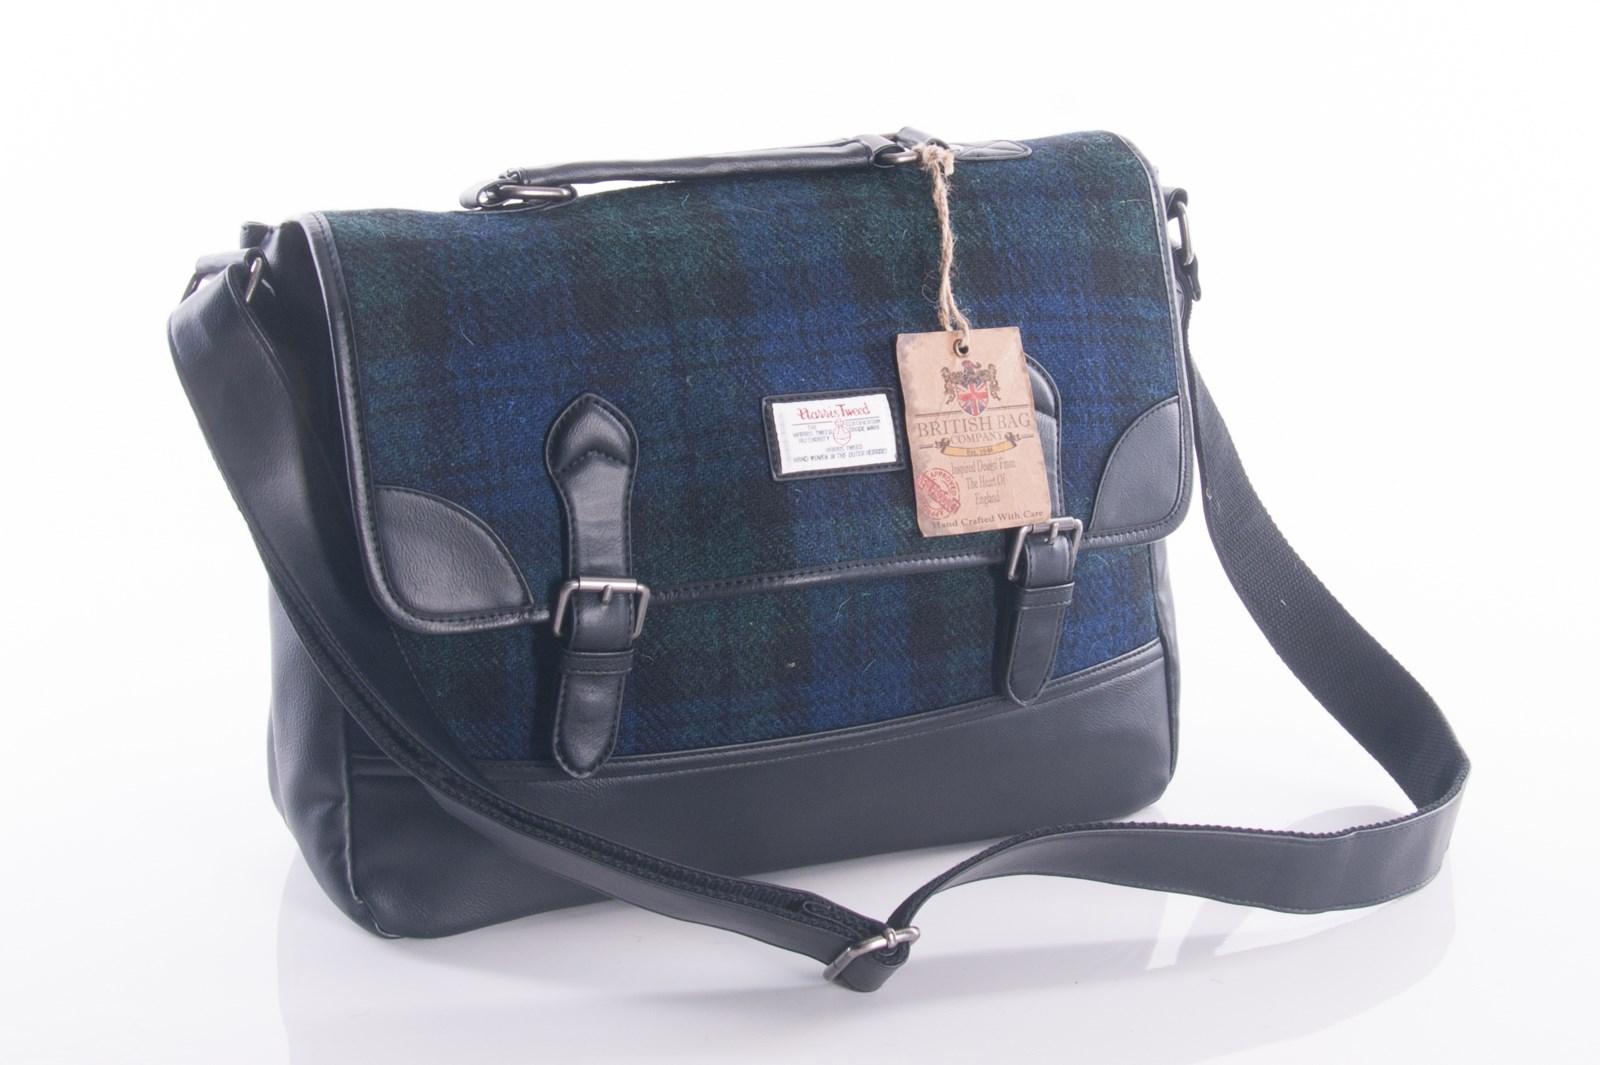 0cfc15c76486 Harris Tweed Black Watch Messenger Bag by the British Bag Company.  magmouch sophos messenger bag black watch 18090042-2